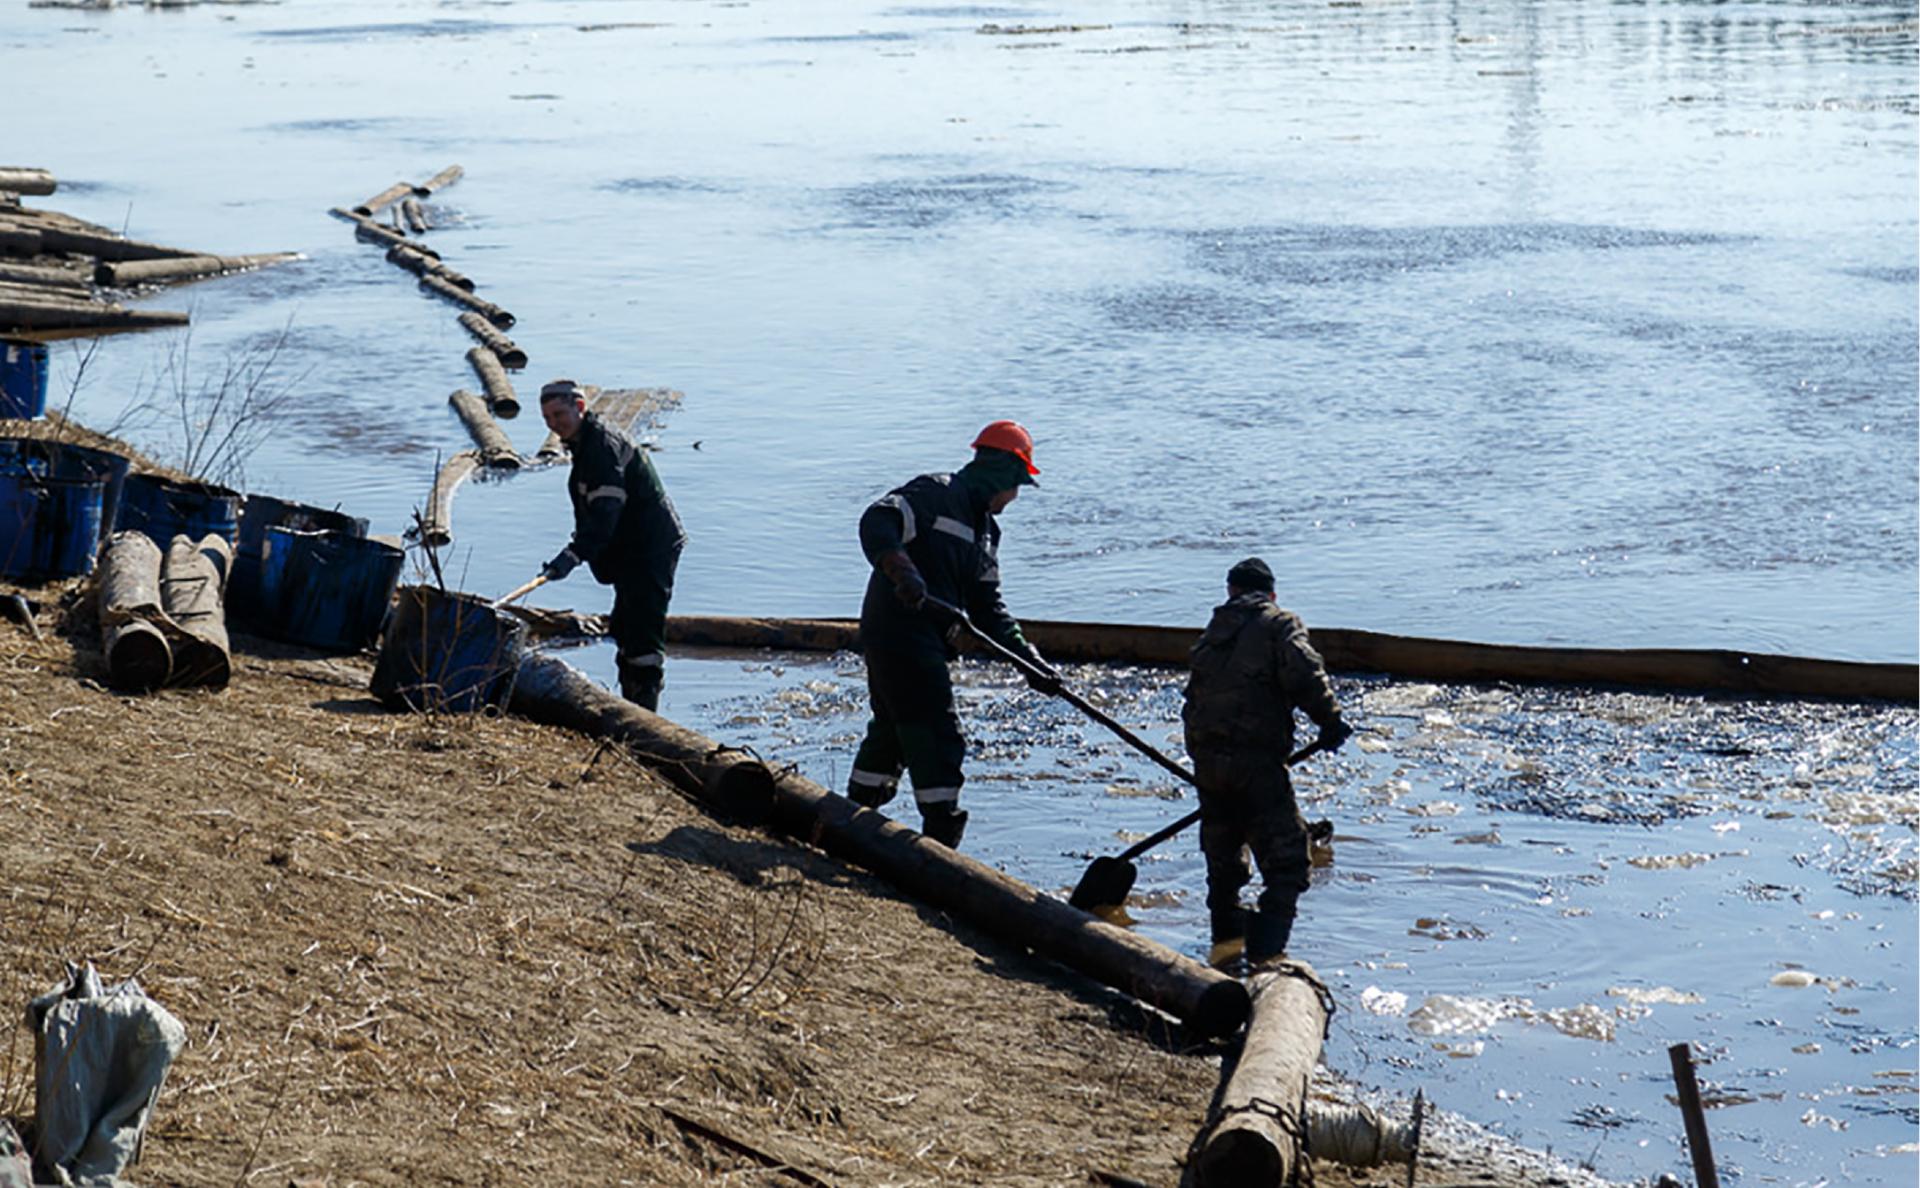 Фото:Пресс-служба главы Коми / ТАСС